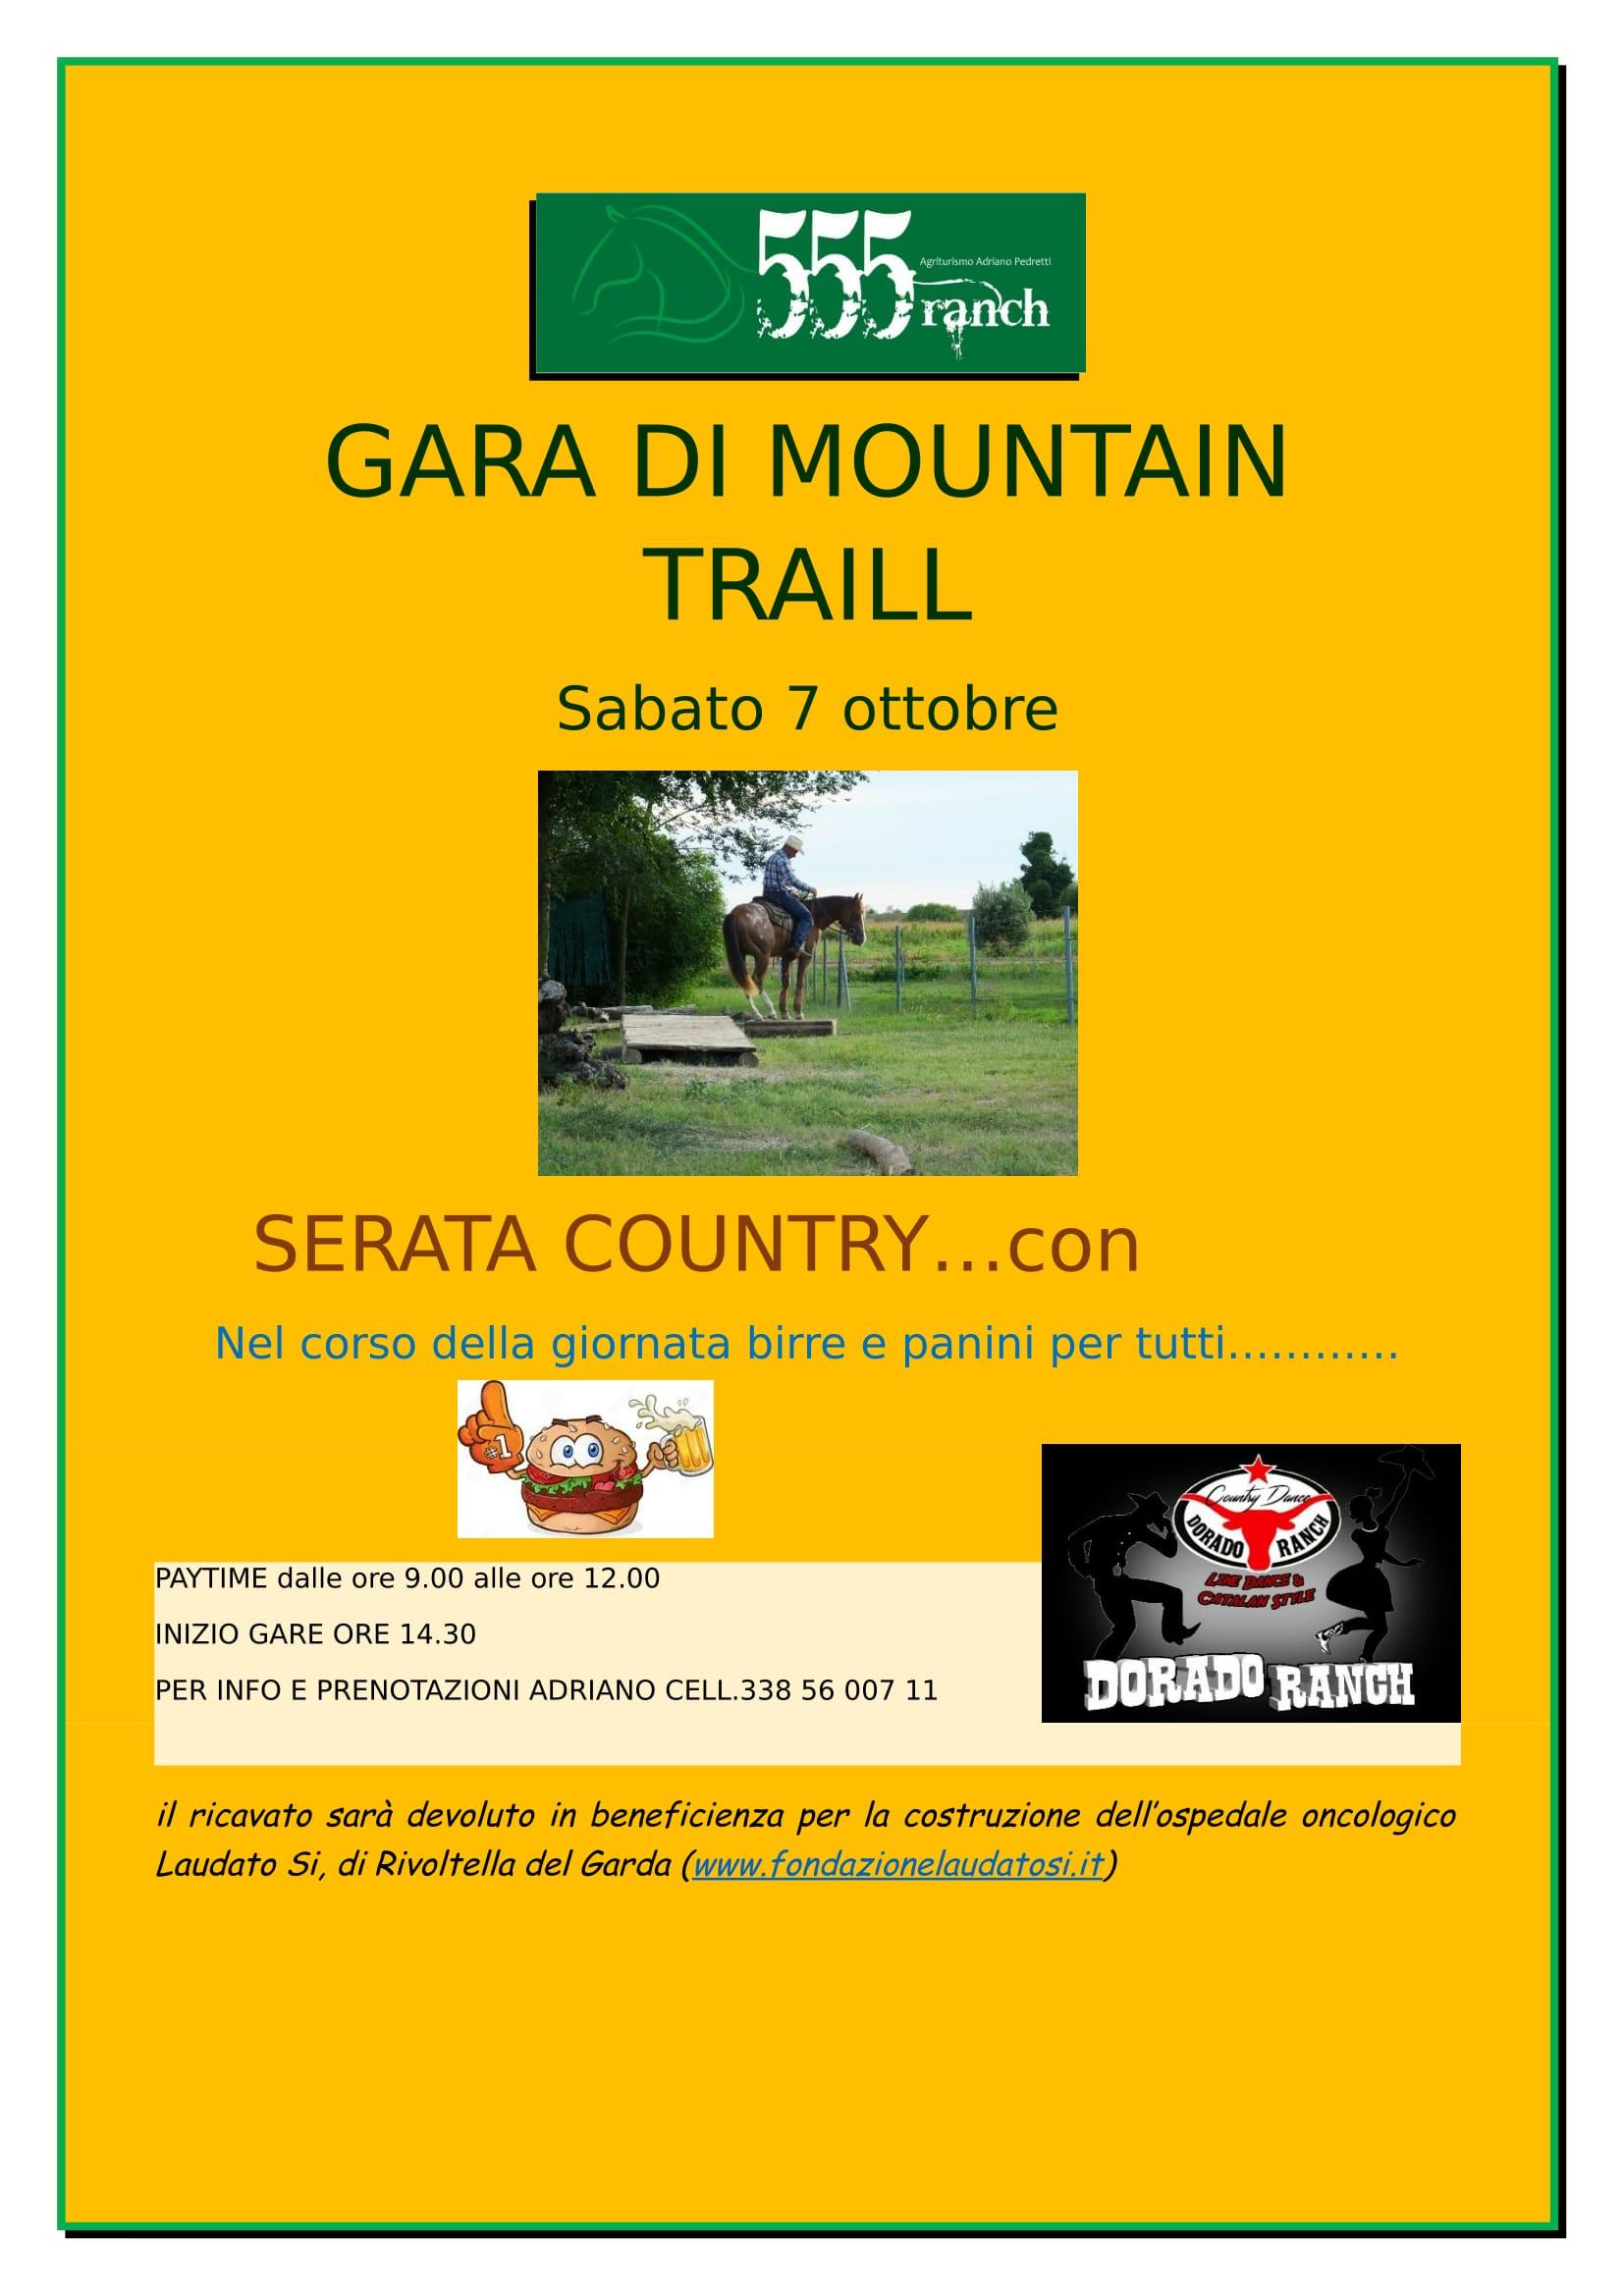 GARA DI MOUNTAIN TRAILL SABATO 7 OTTOBRE 2017